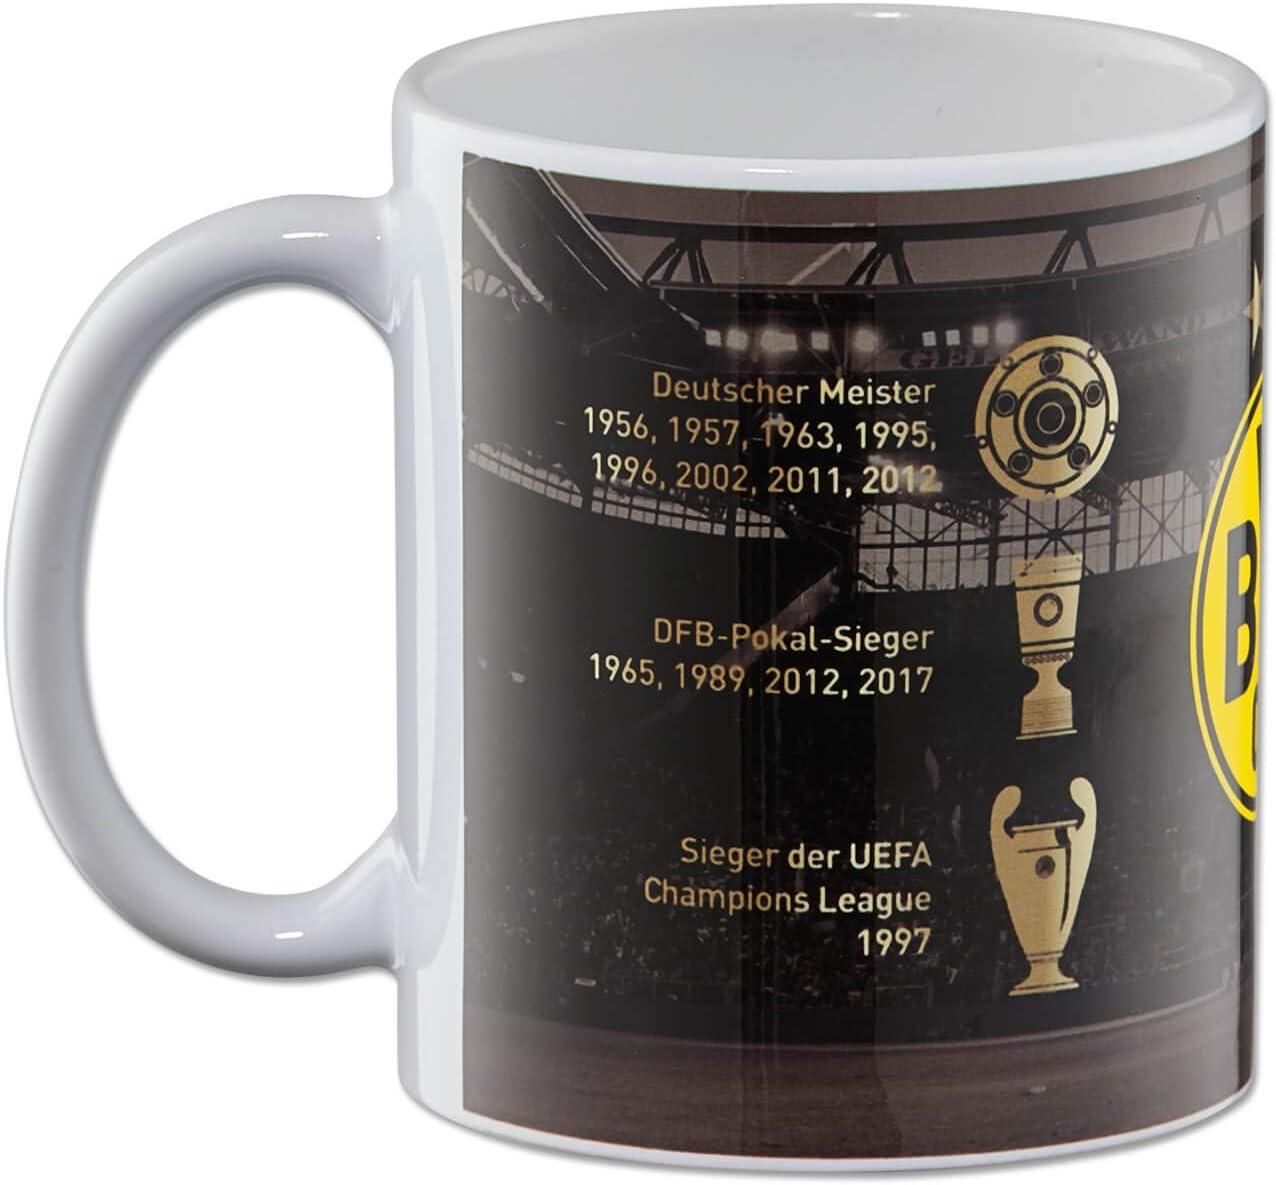 Borussia Dortmund BVB Cup//Coffee Mug with Achievements